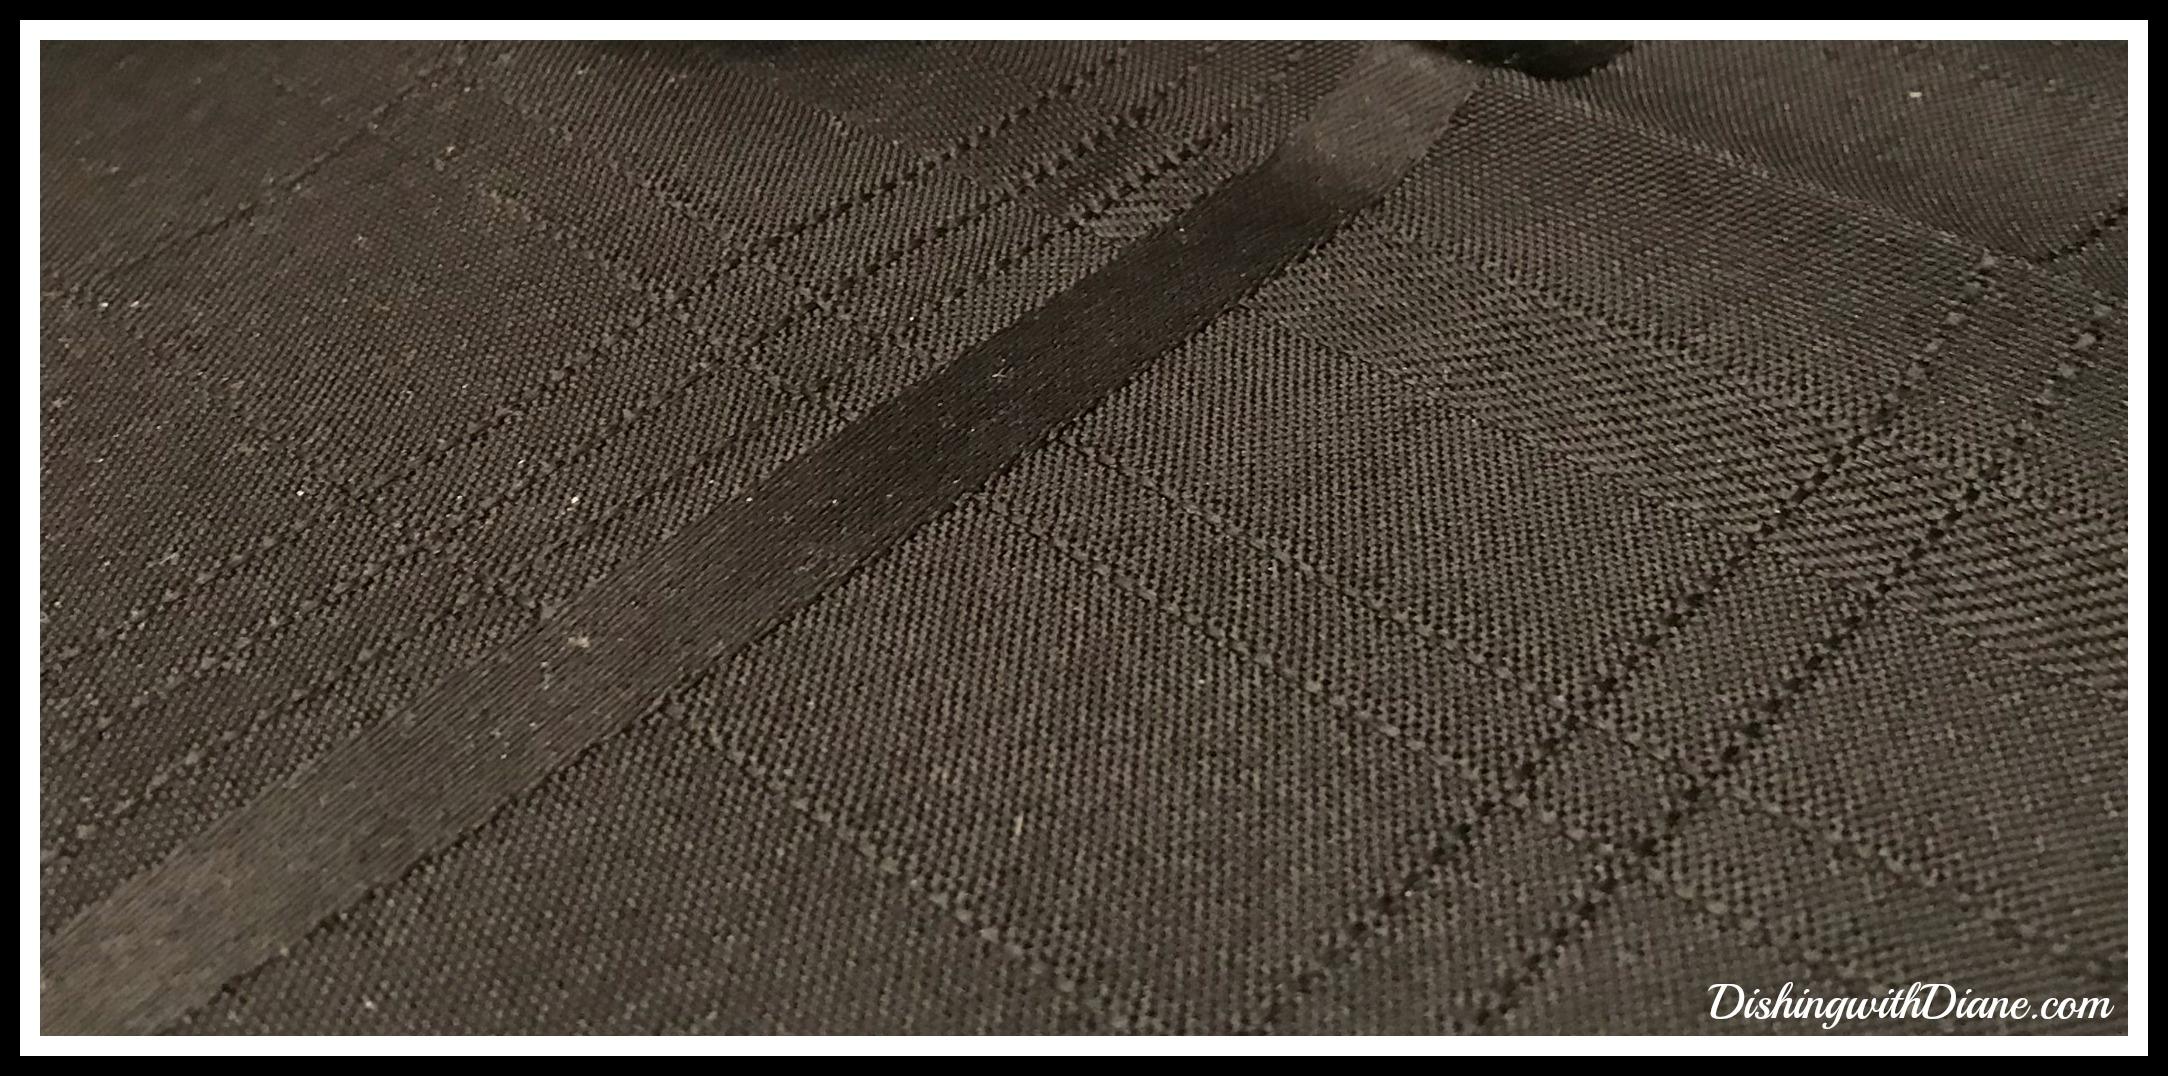 photo jan 26, 1 17 57 am tablecloth